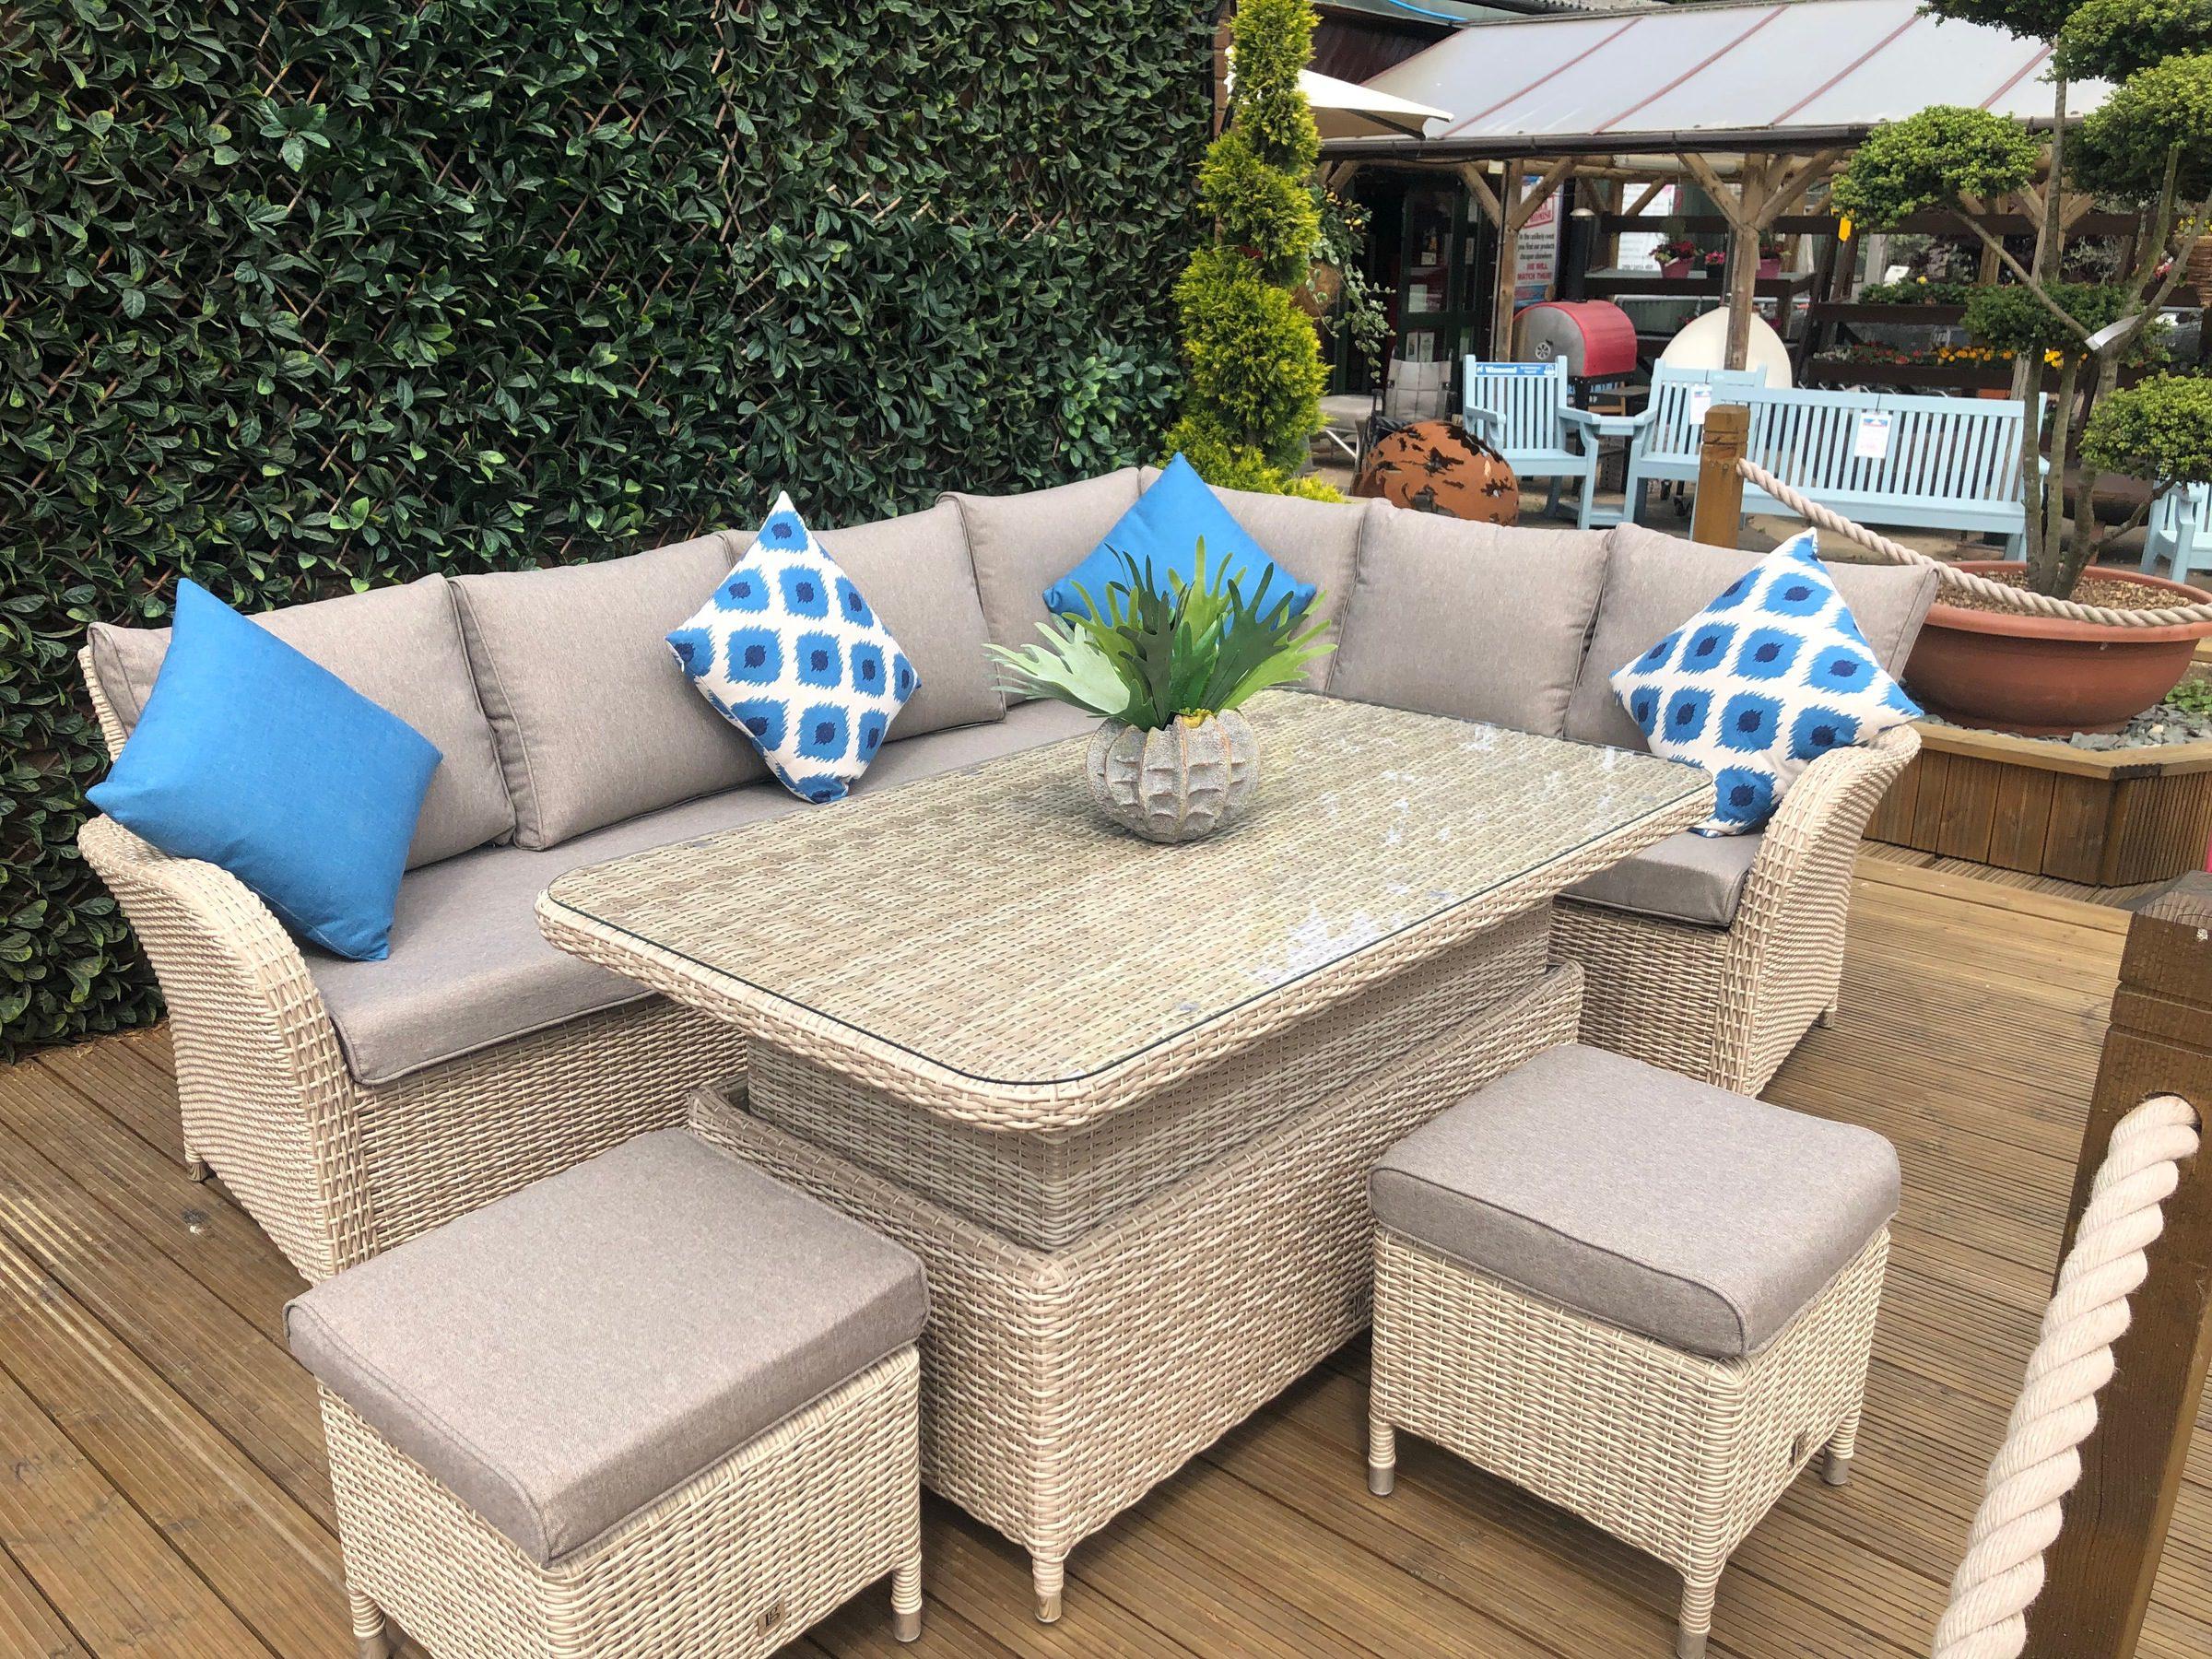 LeisureGrow Monaco Rectangular Dining Set with Adjustable Table